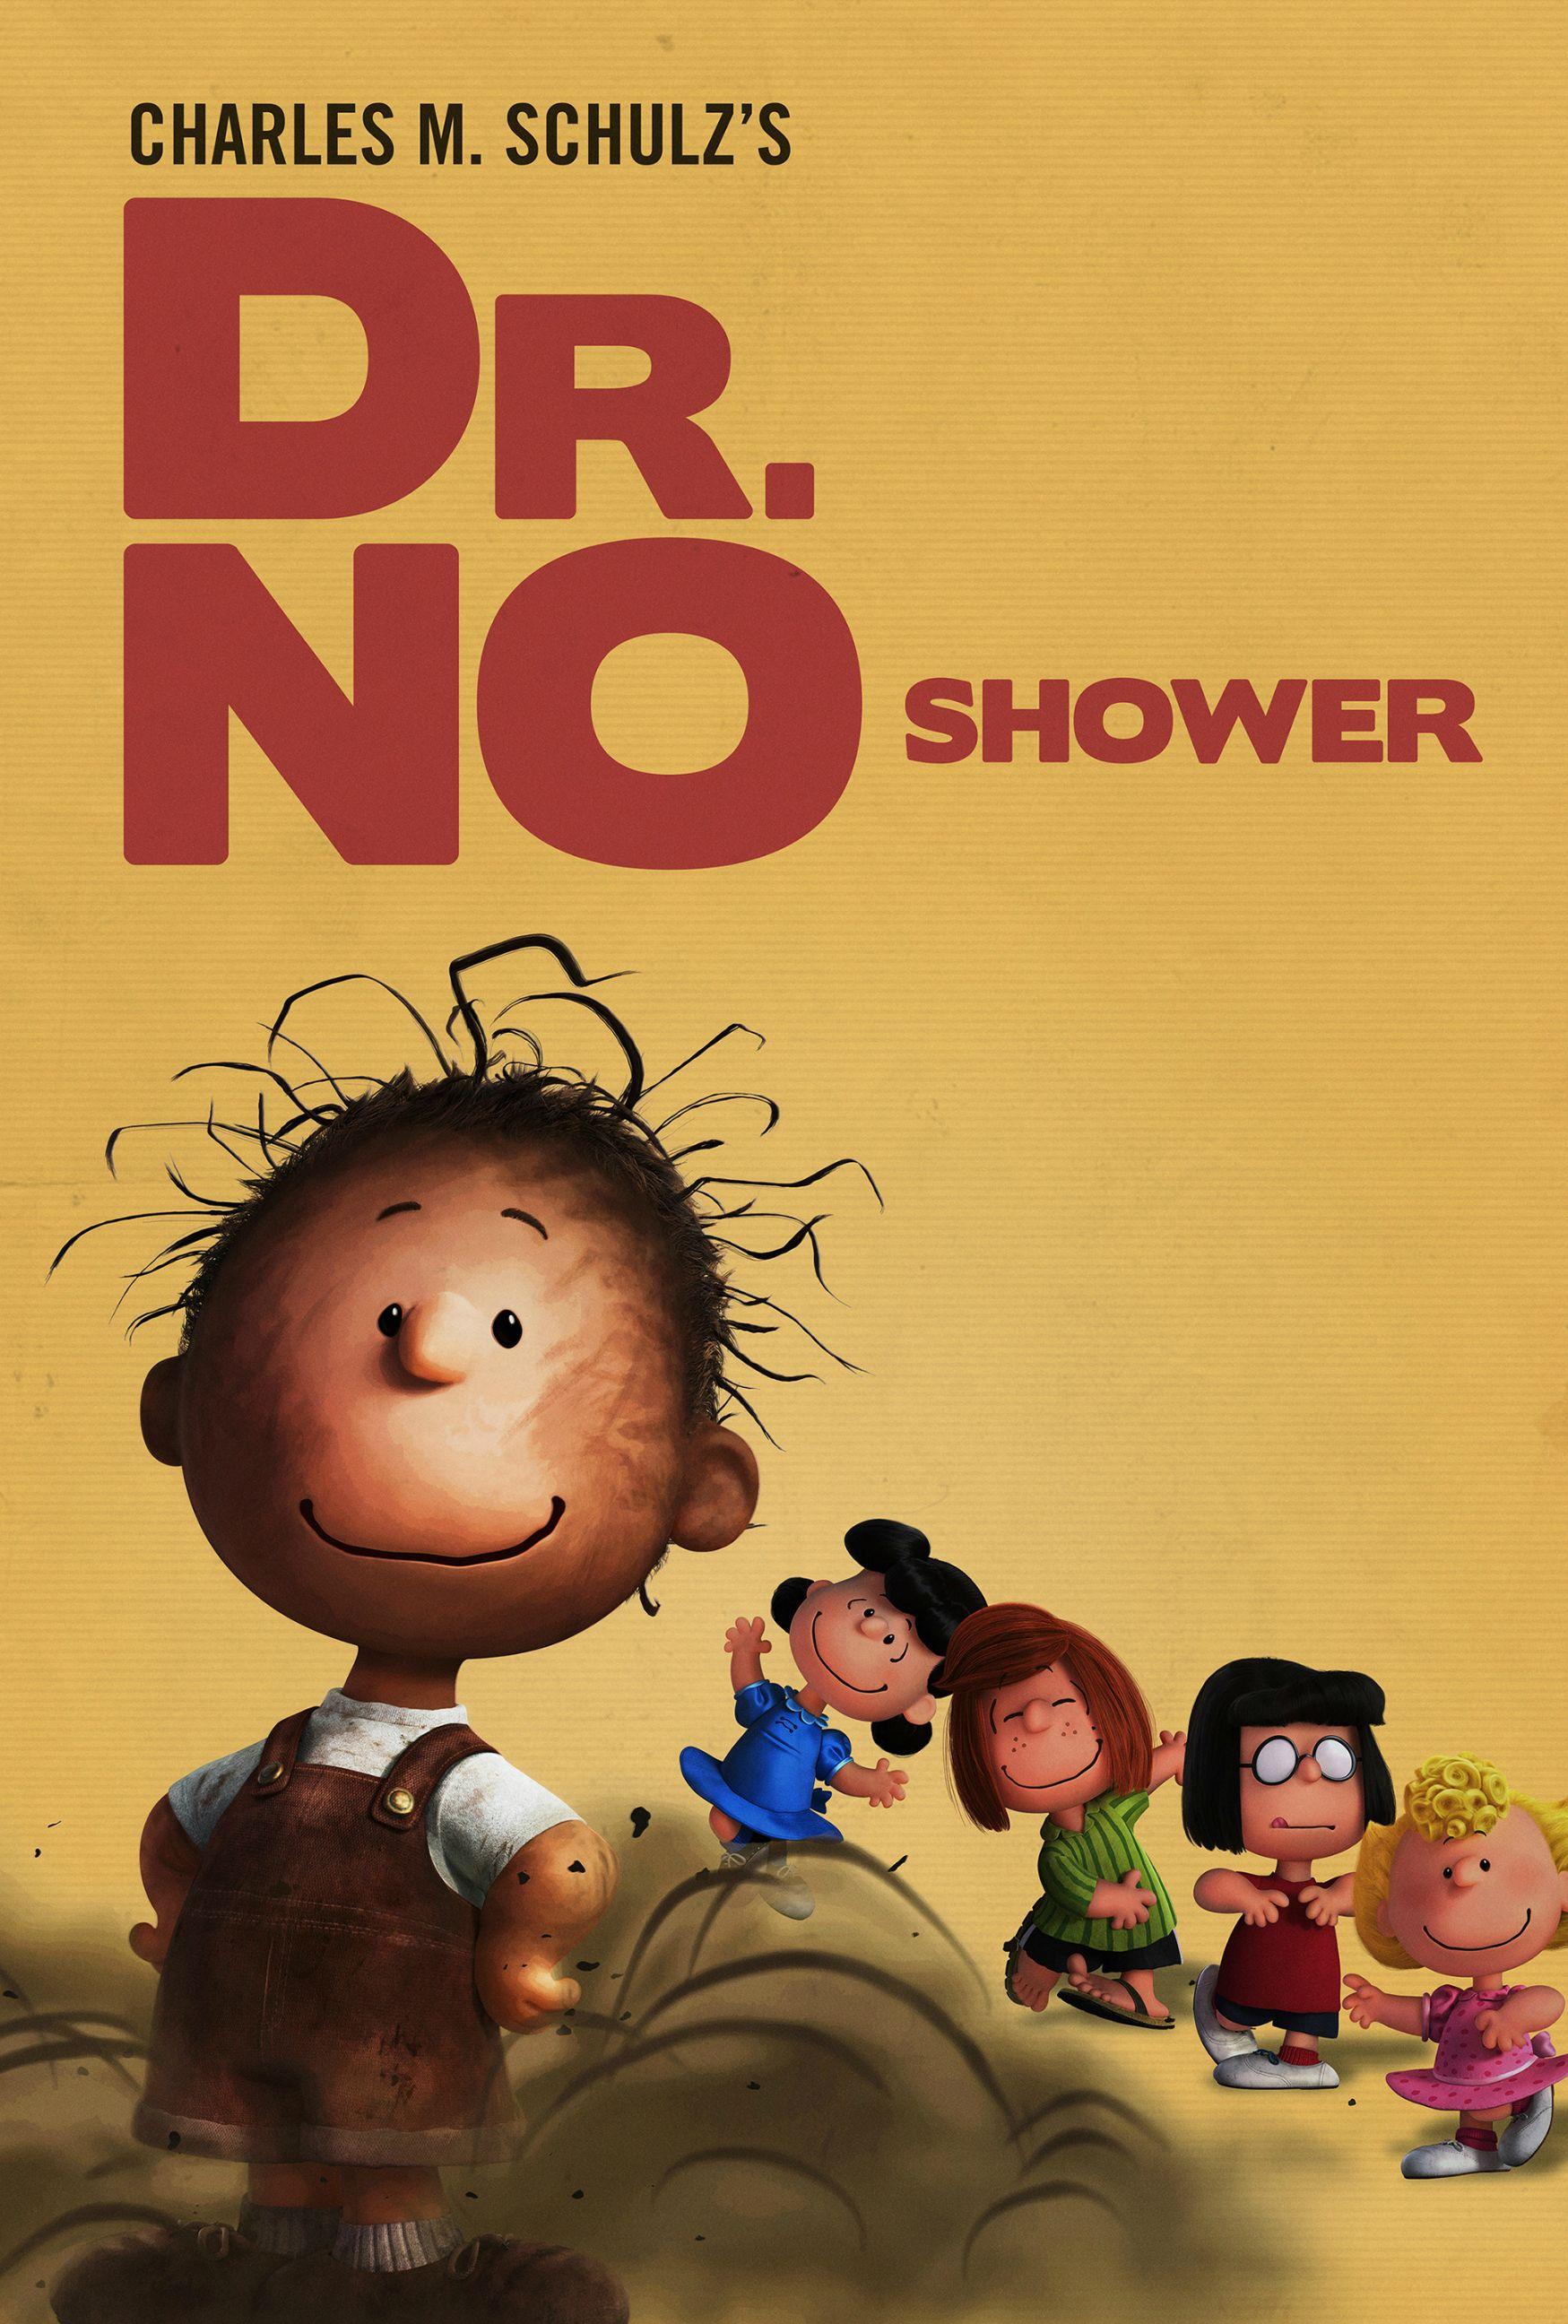 Snoopy & Friends: Pigpen nel poster parodia dei film di James Bond